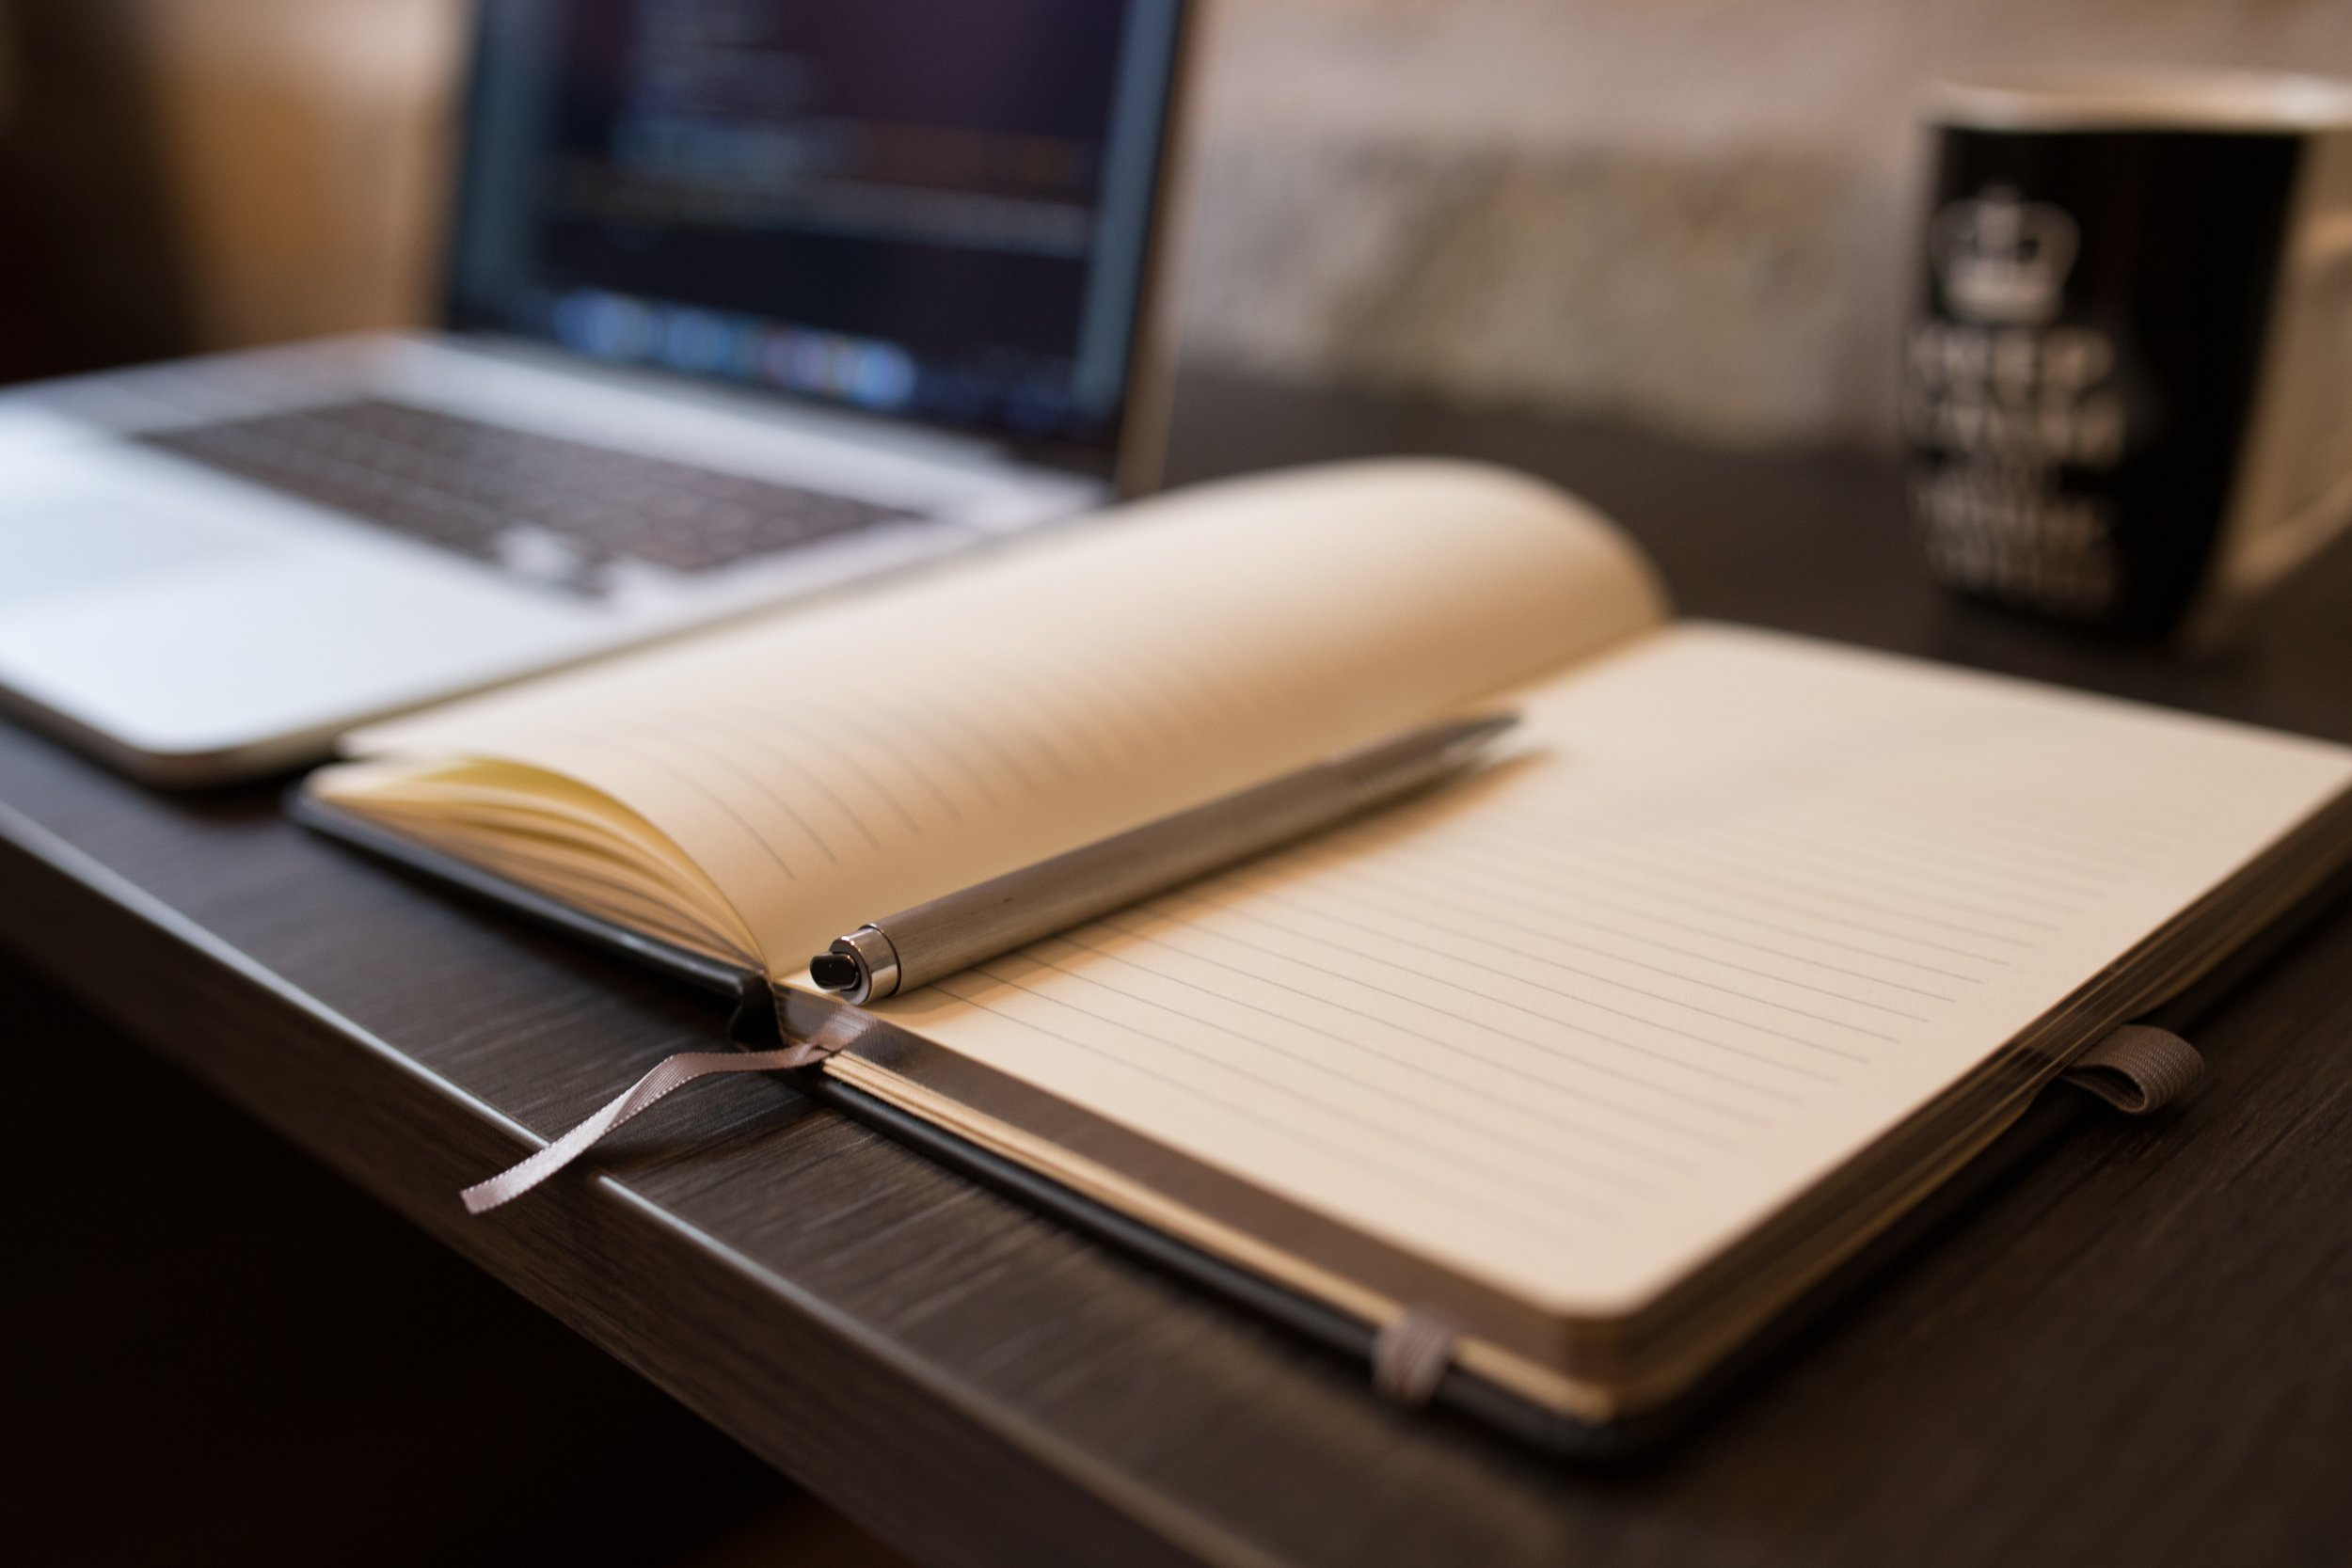 blogging-computer-desk-34658.jpg